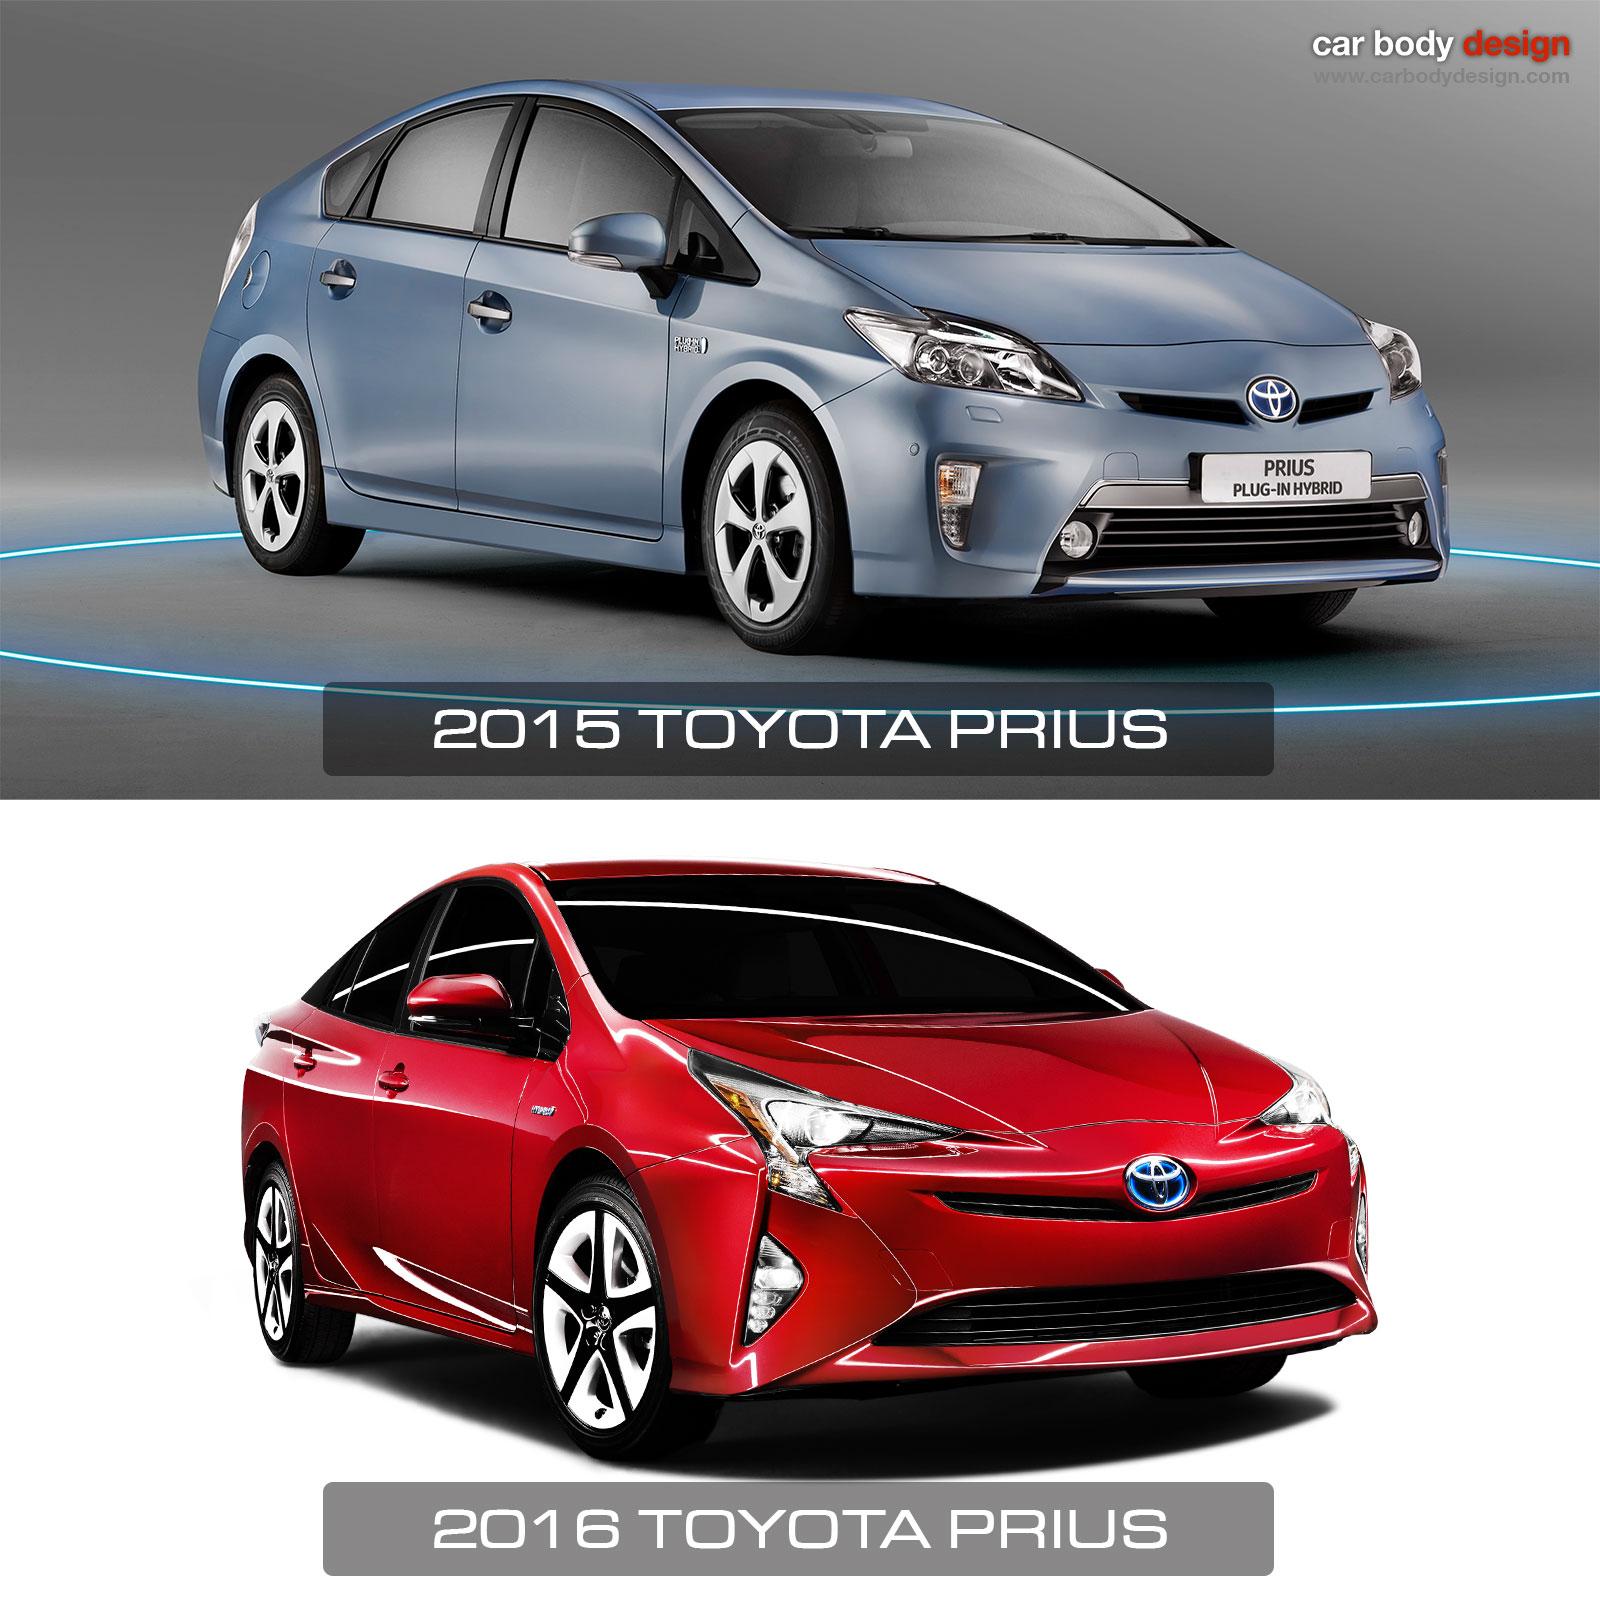 2016 Vs 2017 Toyota Prius Design Comparison